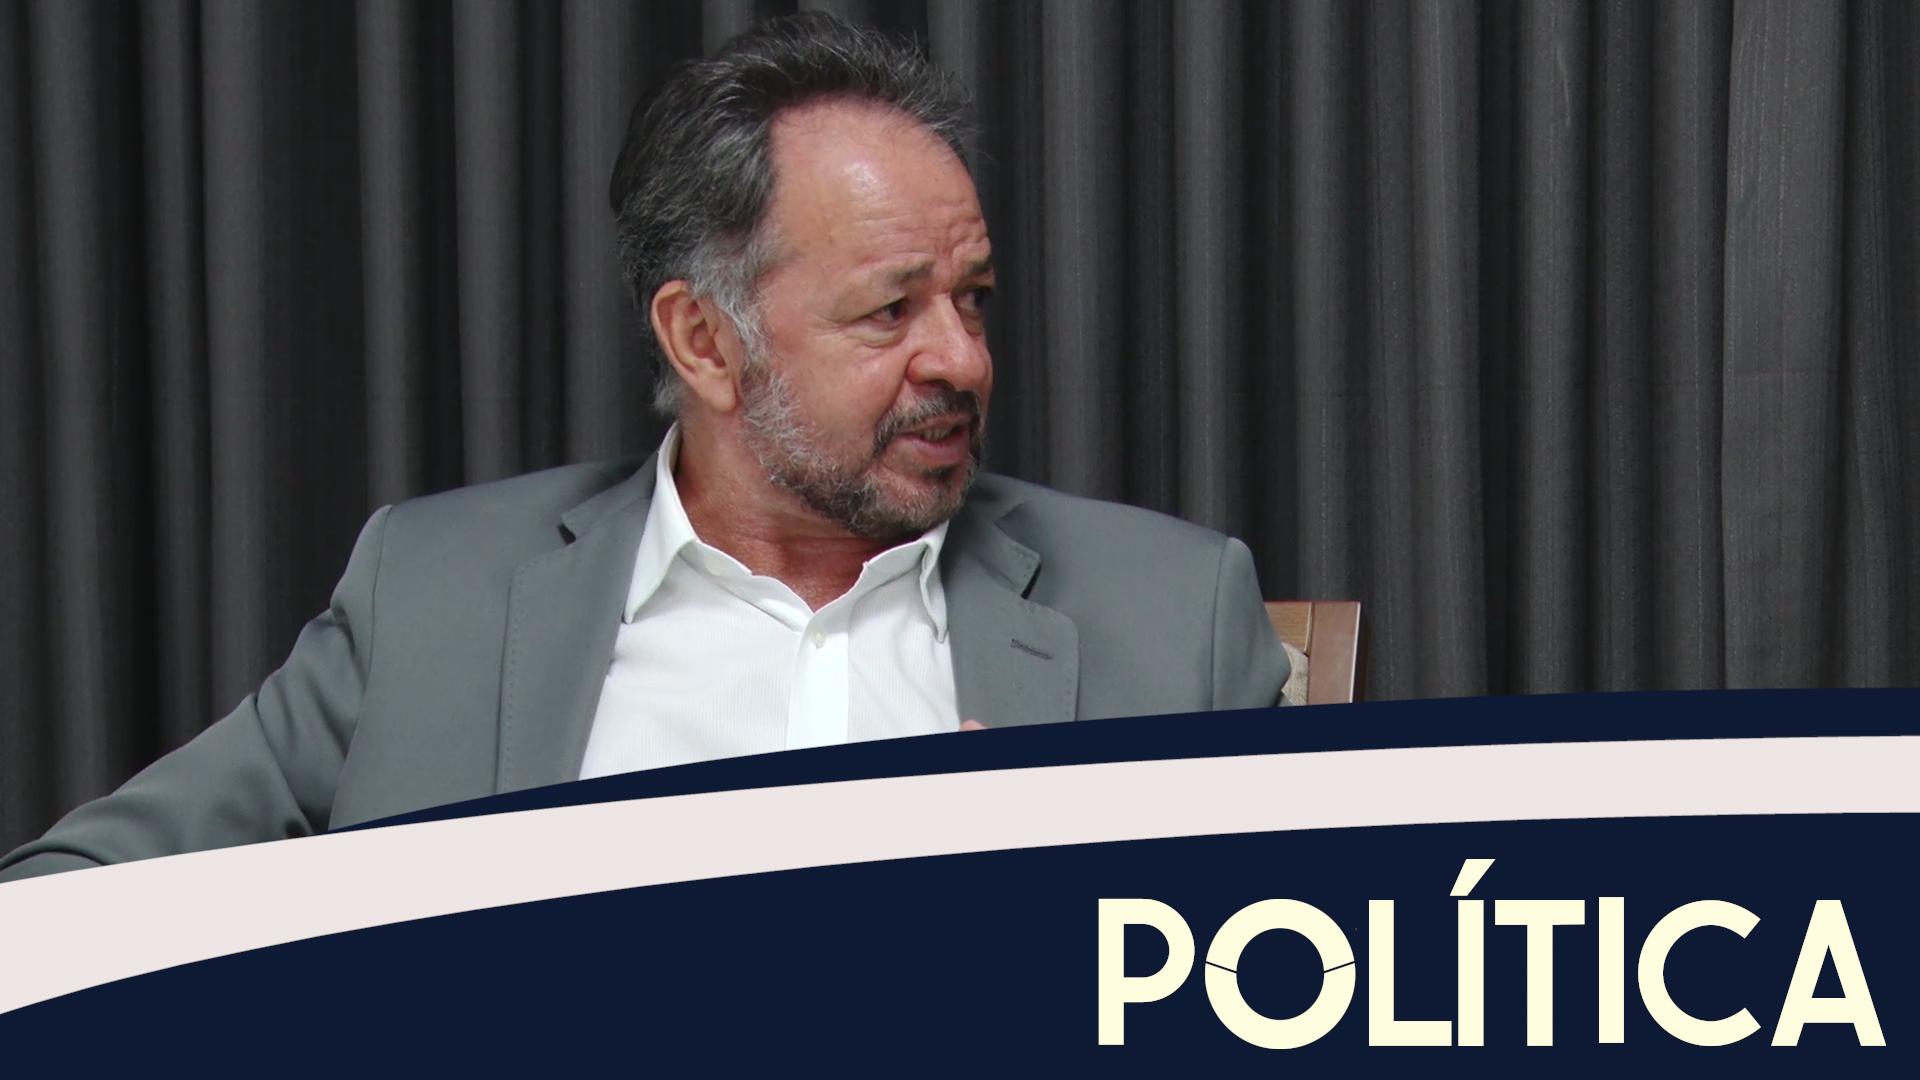 Política entrevista, Acrisio Sena, Deputado Estadual